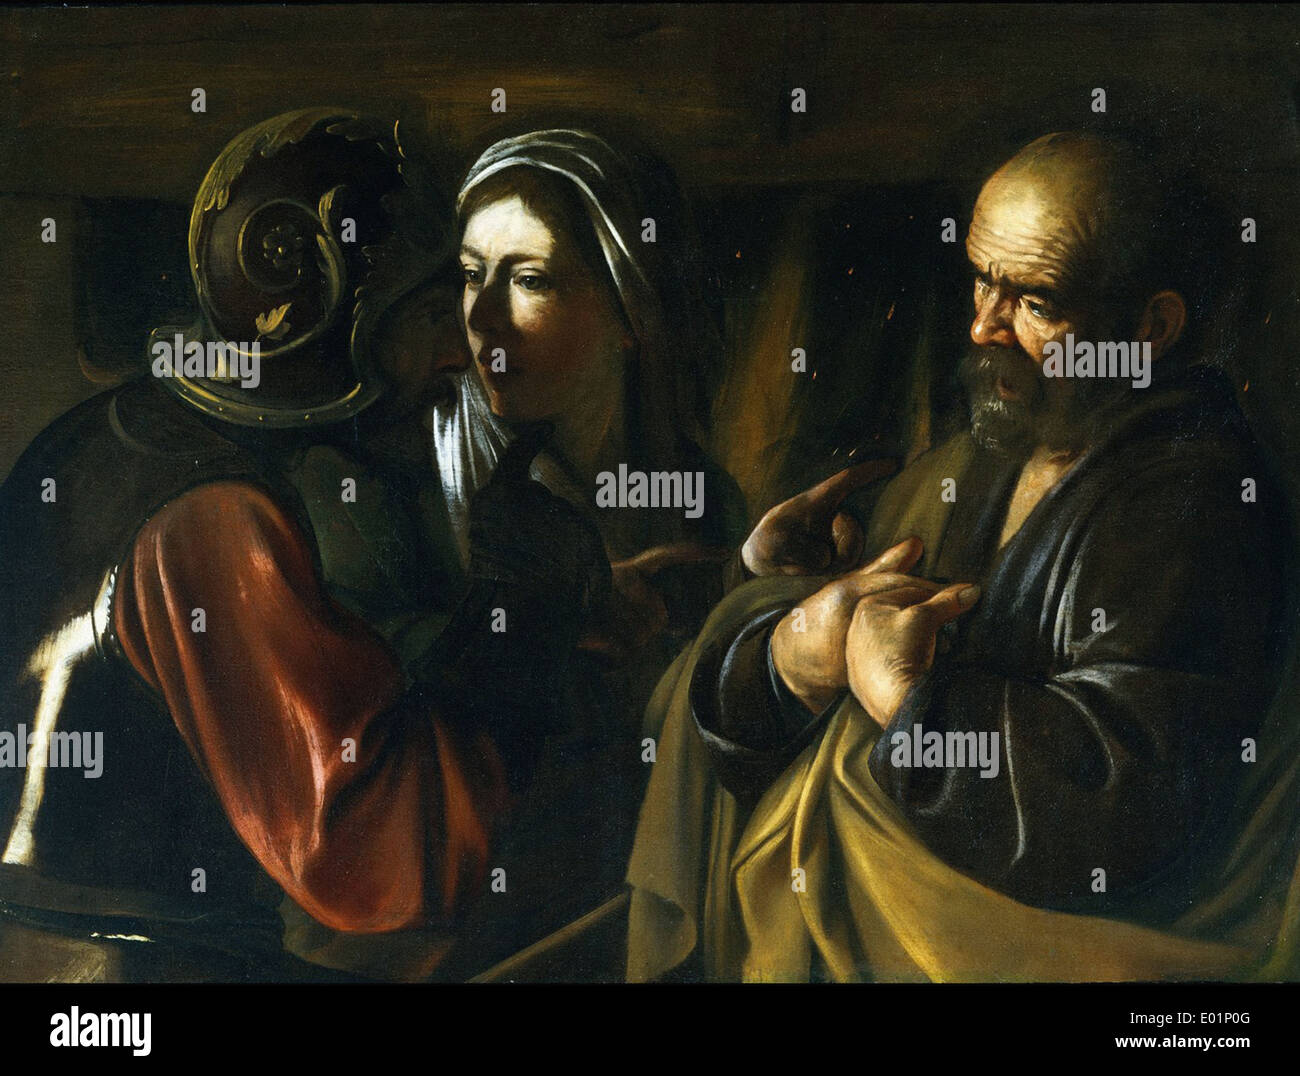 Caravaggio The Denial of Saint Peter - Stock Image